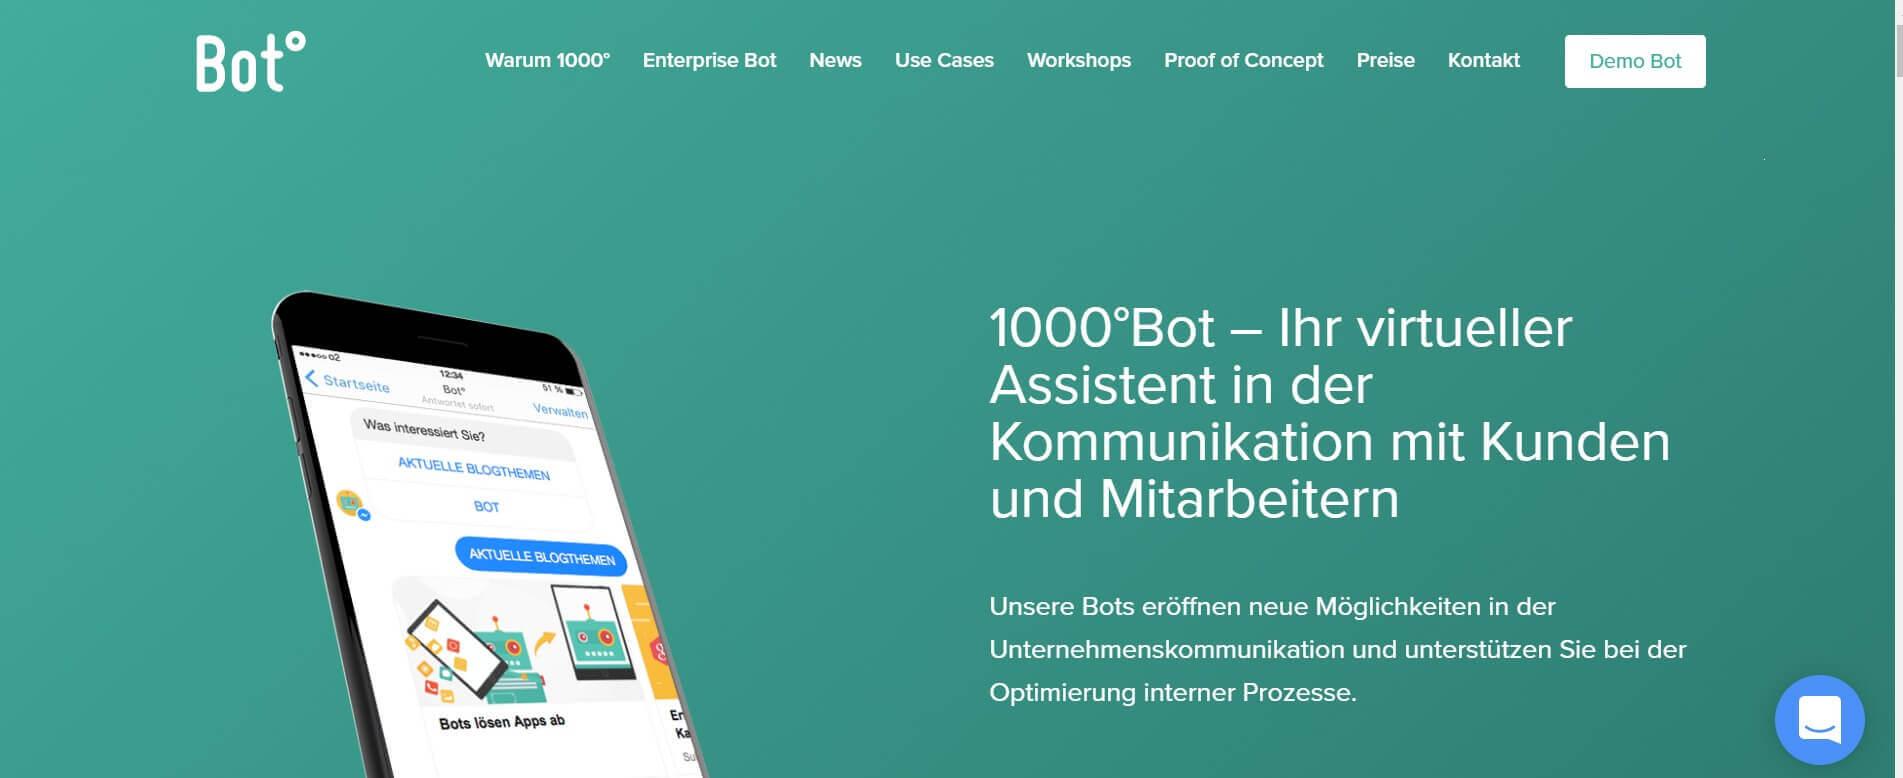 Chatbot erstellen 1000 Bot 1